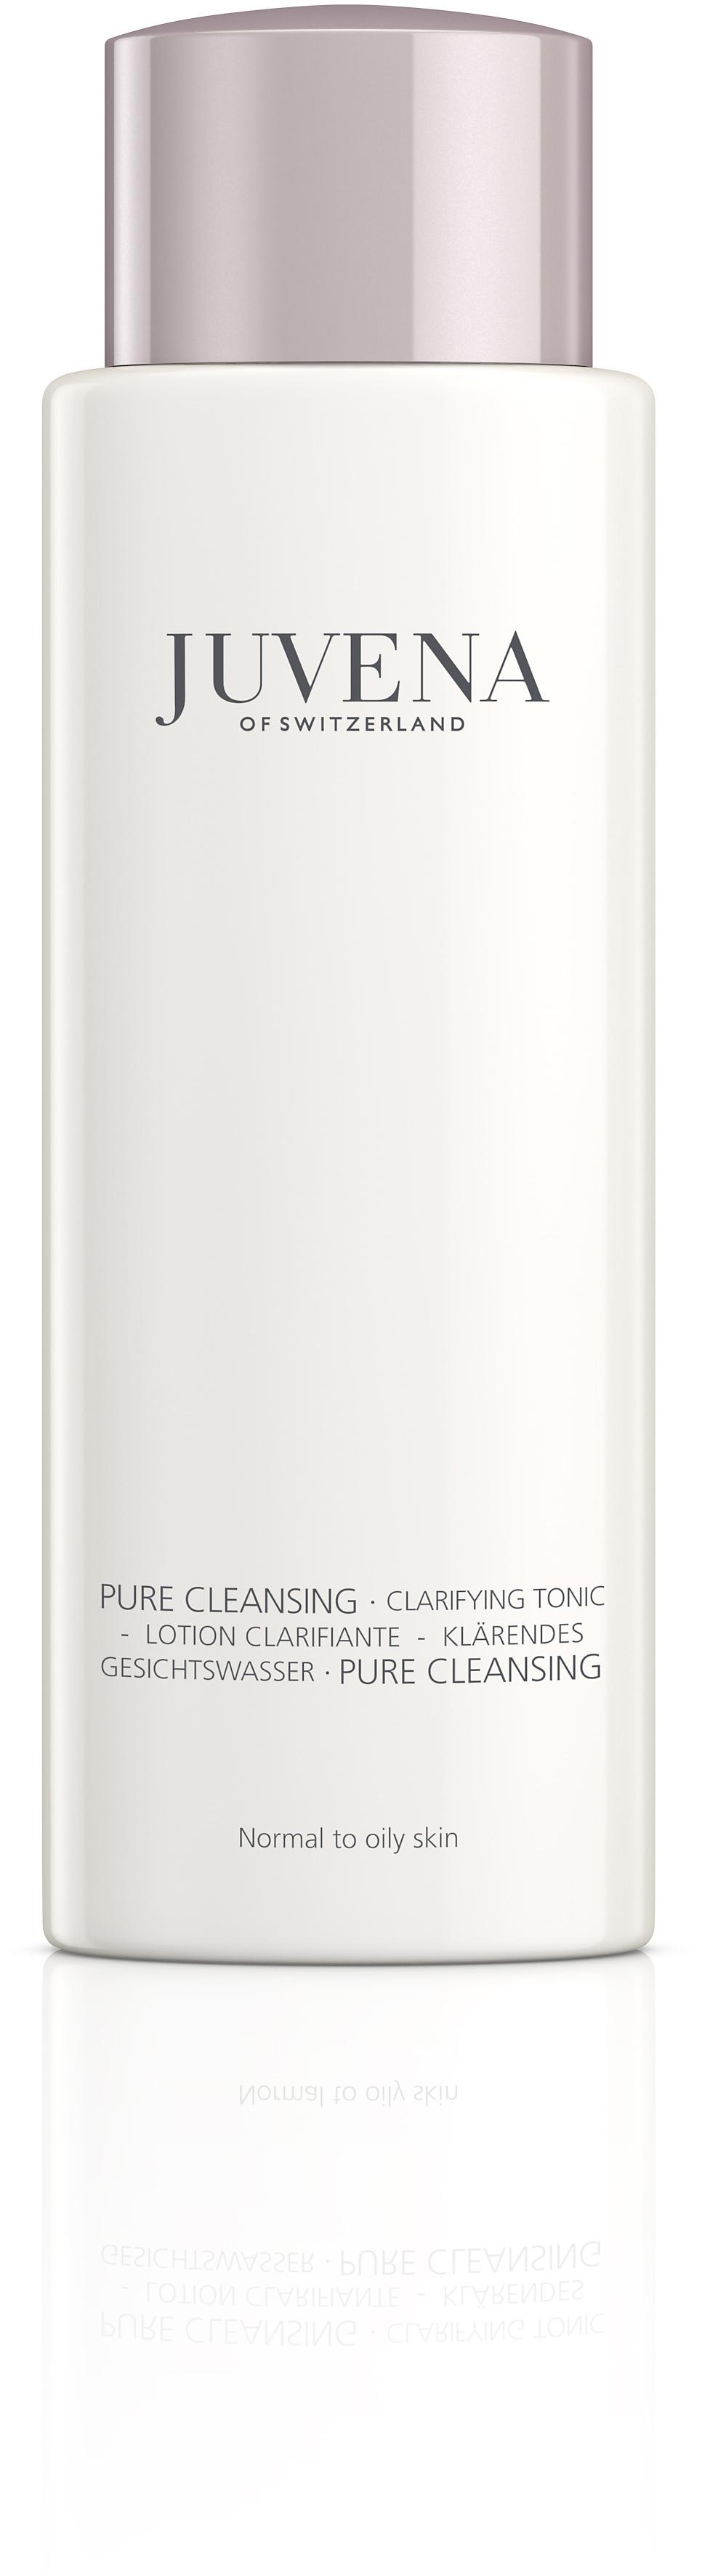 Juvena Pure Clarifying Tonic 200 ml